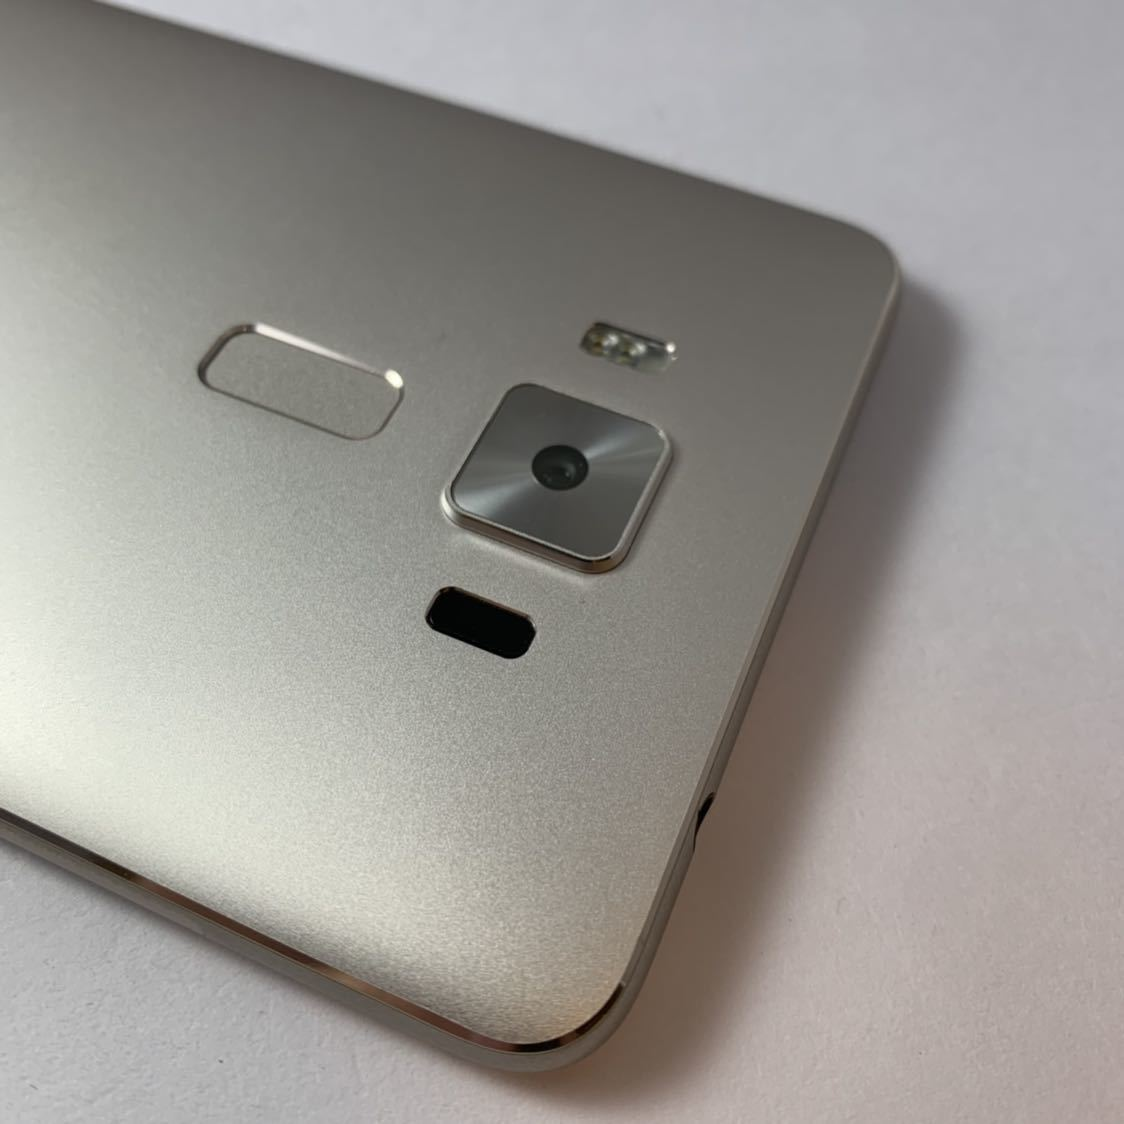 ASUS Zenfone 3 Deluxe 5.5 ZS550KL 64GB SIMフリー 本体 Z01FD ゴールド 海外版_画像3